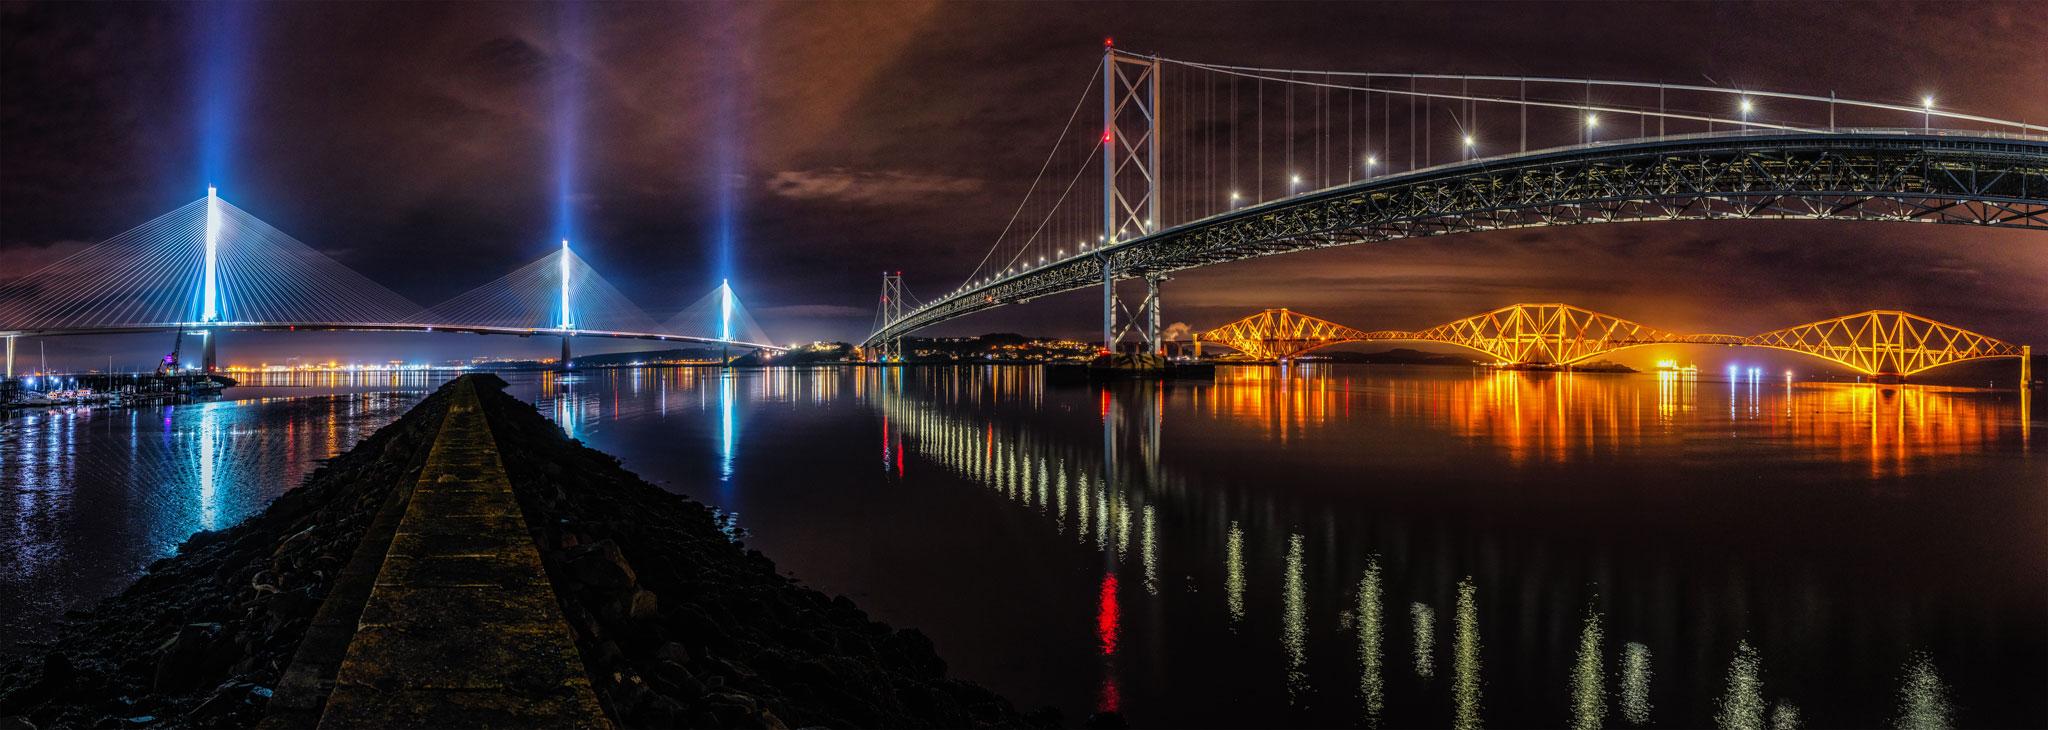 The Three Bridges at Night.